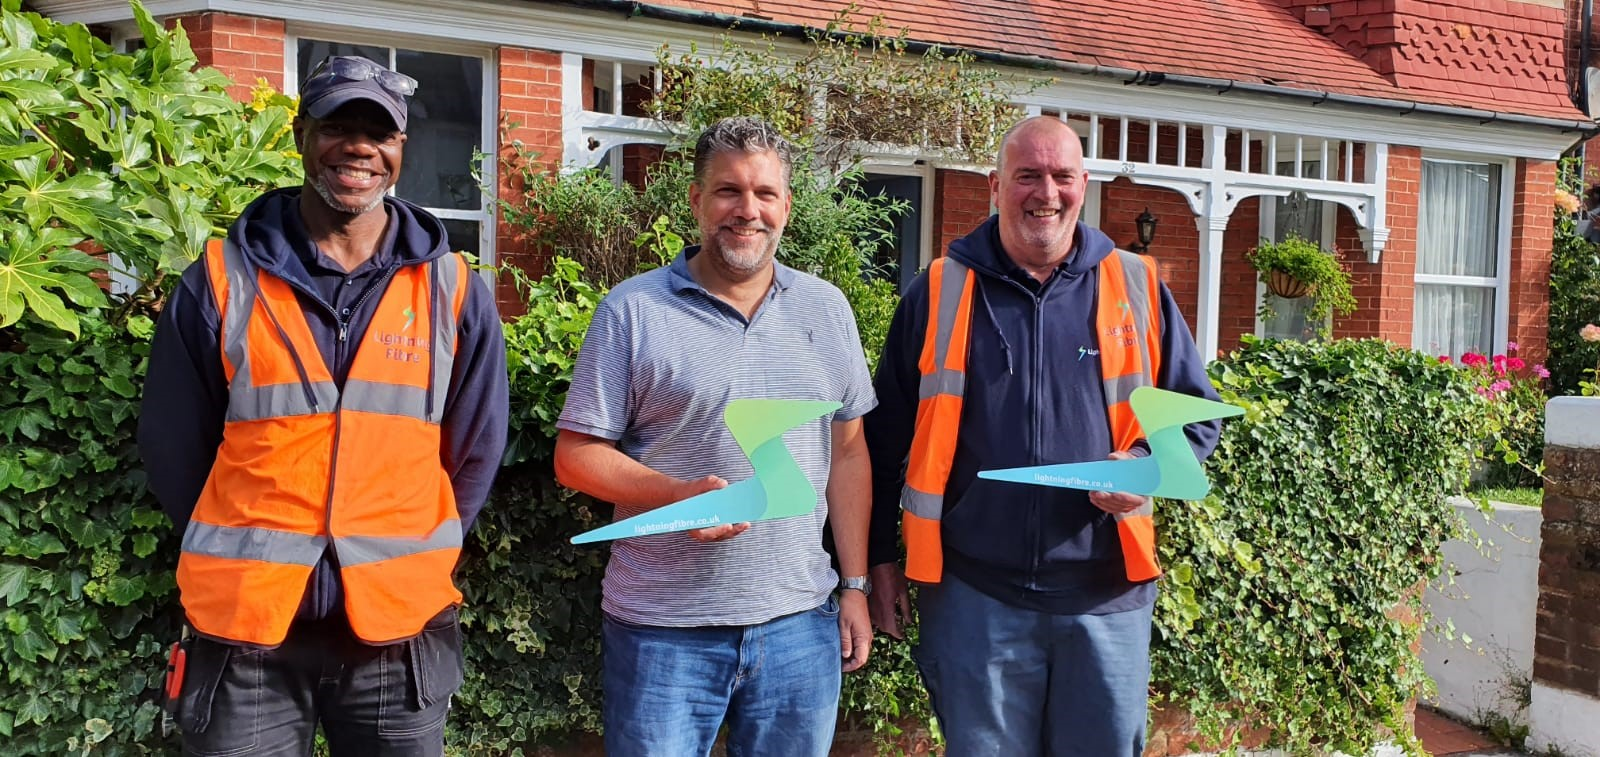 10,000 Homes Passed, Lightning Fibre Broadband celebrates another milestone